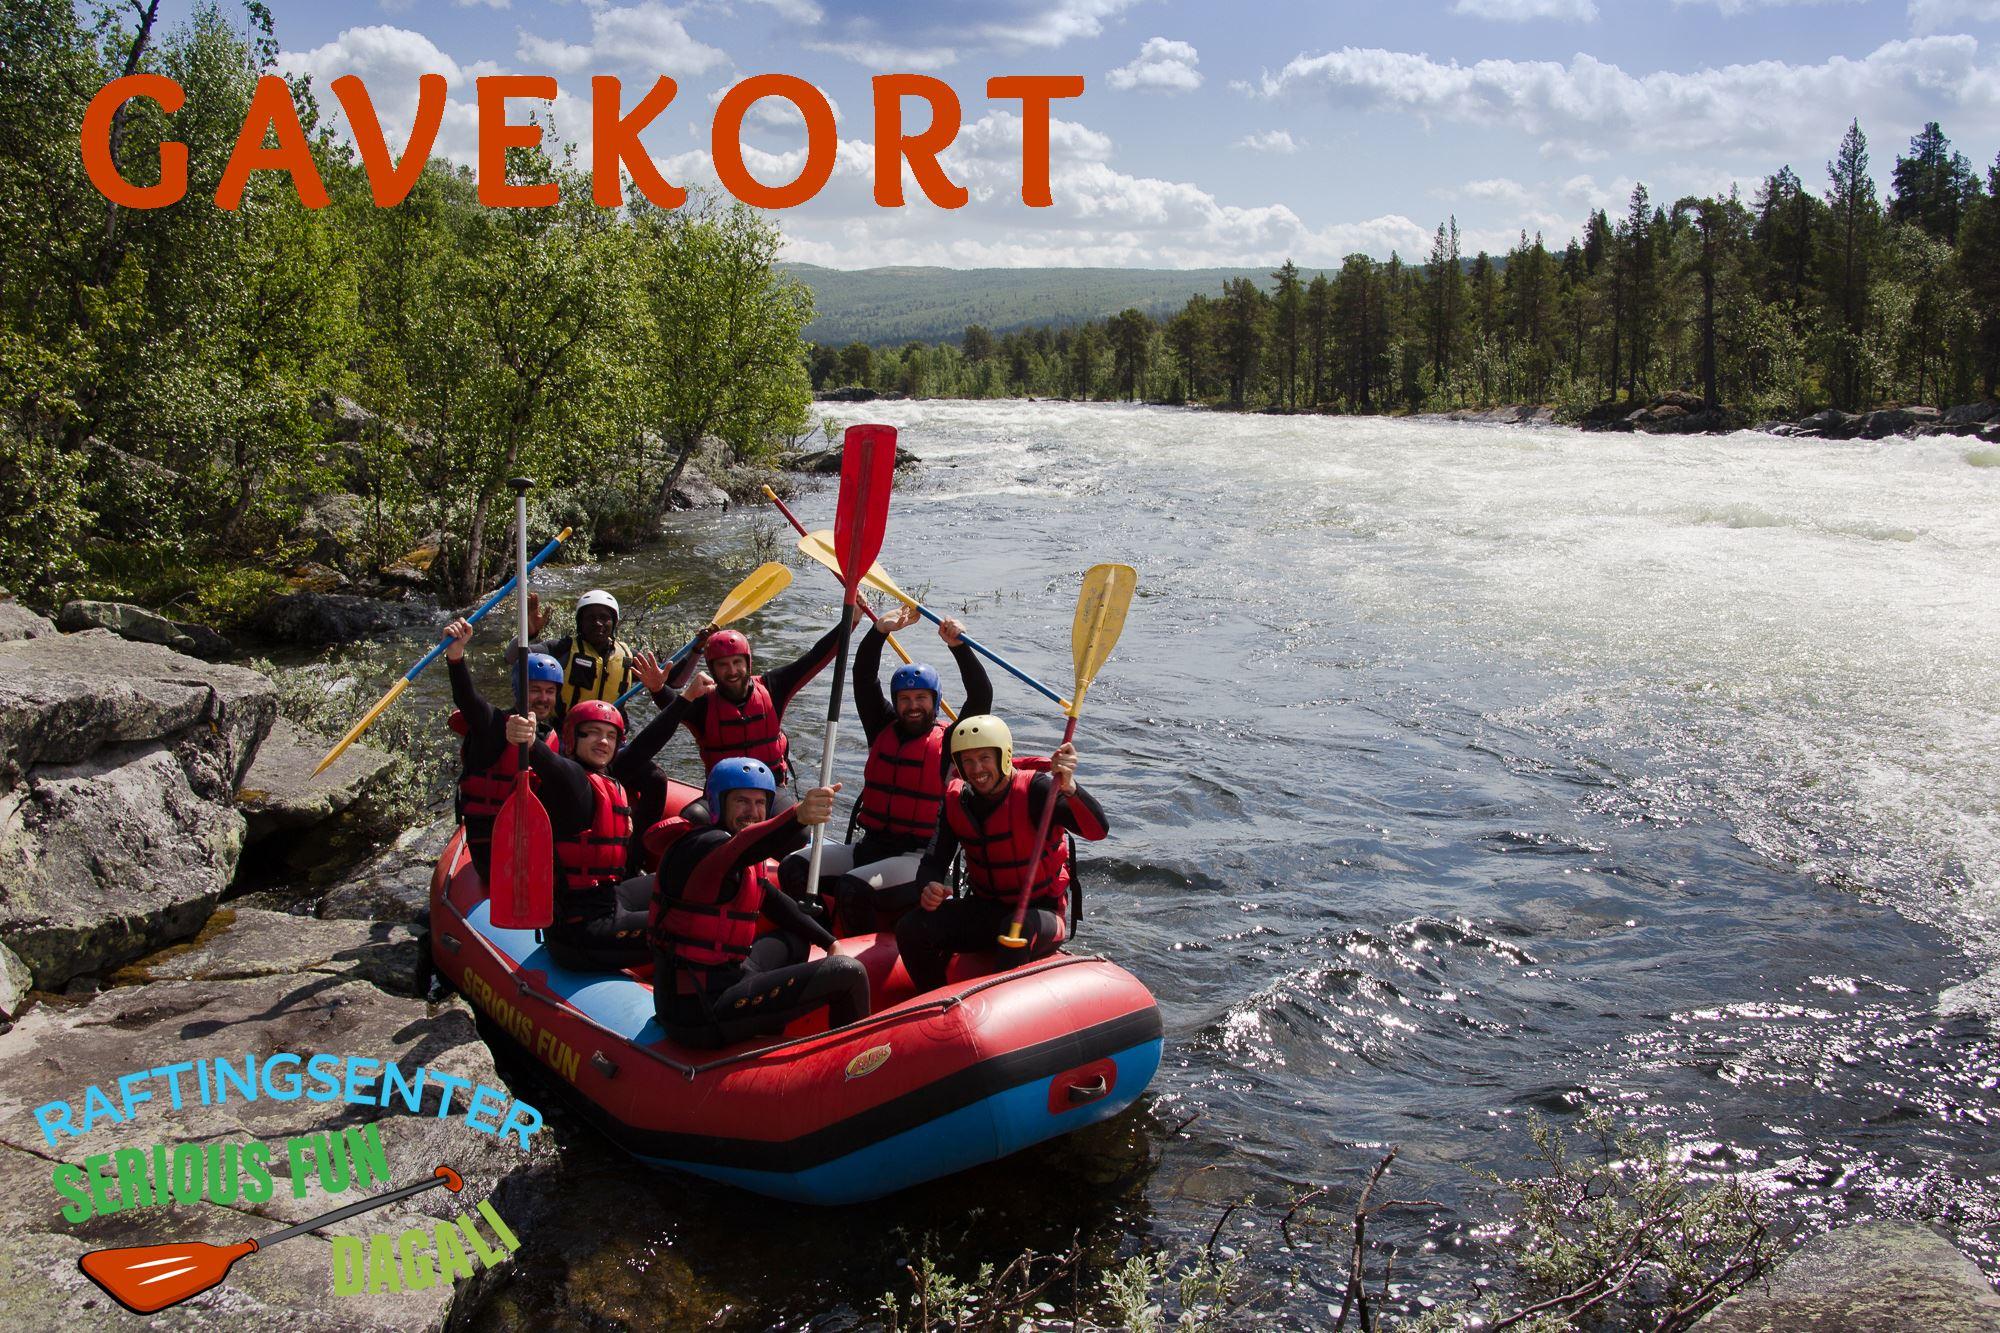 Gavekort Rafting